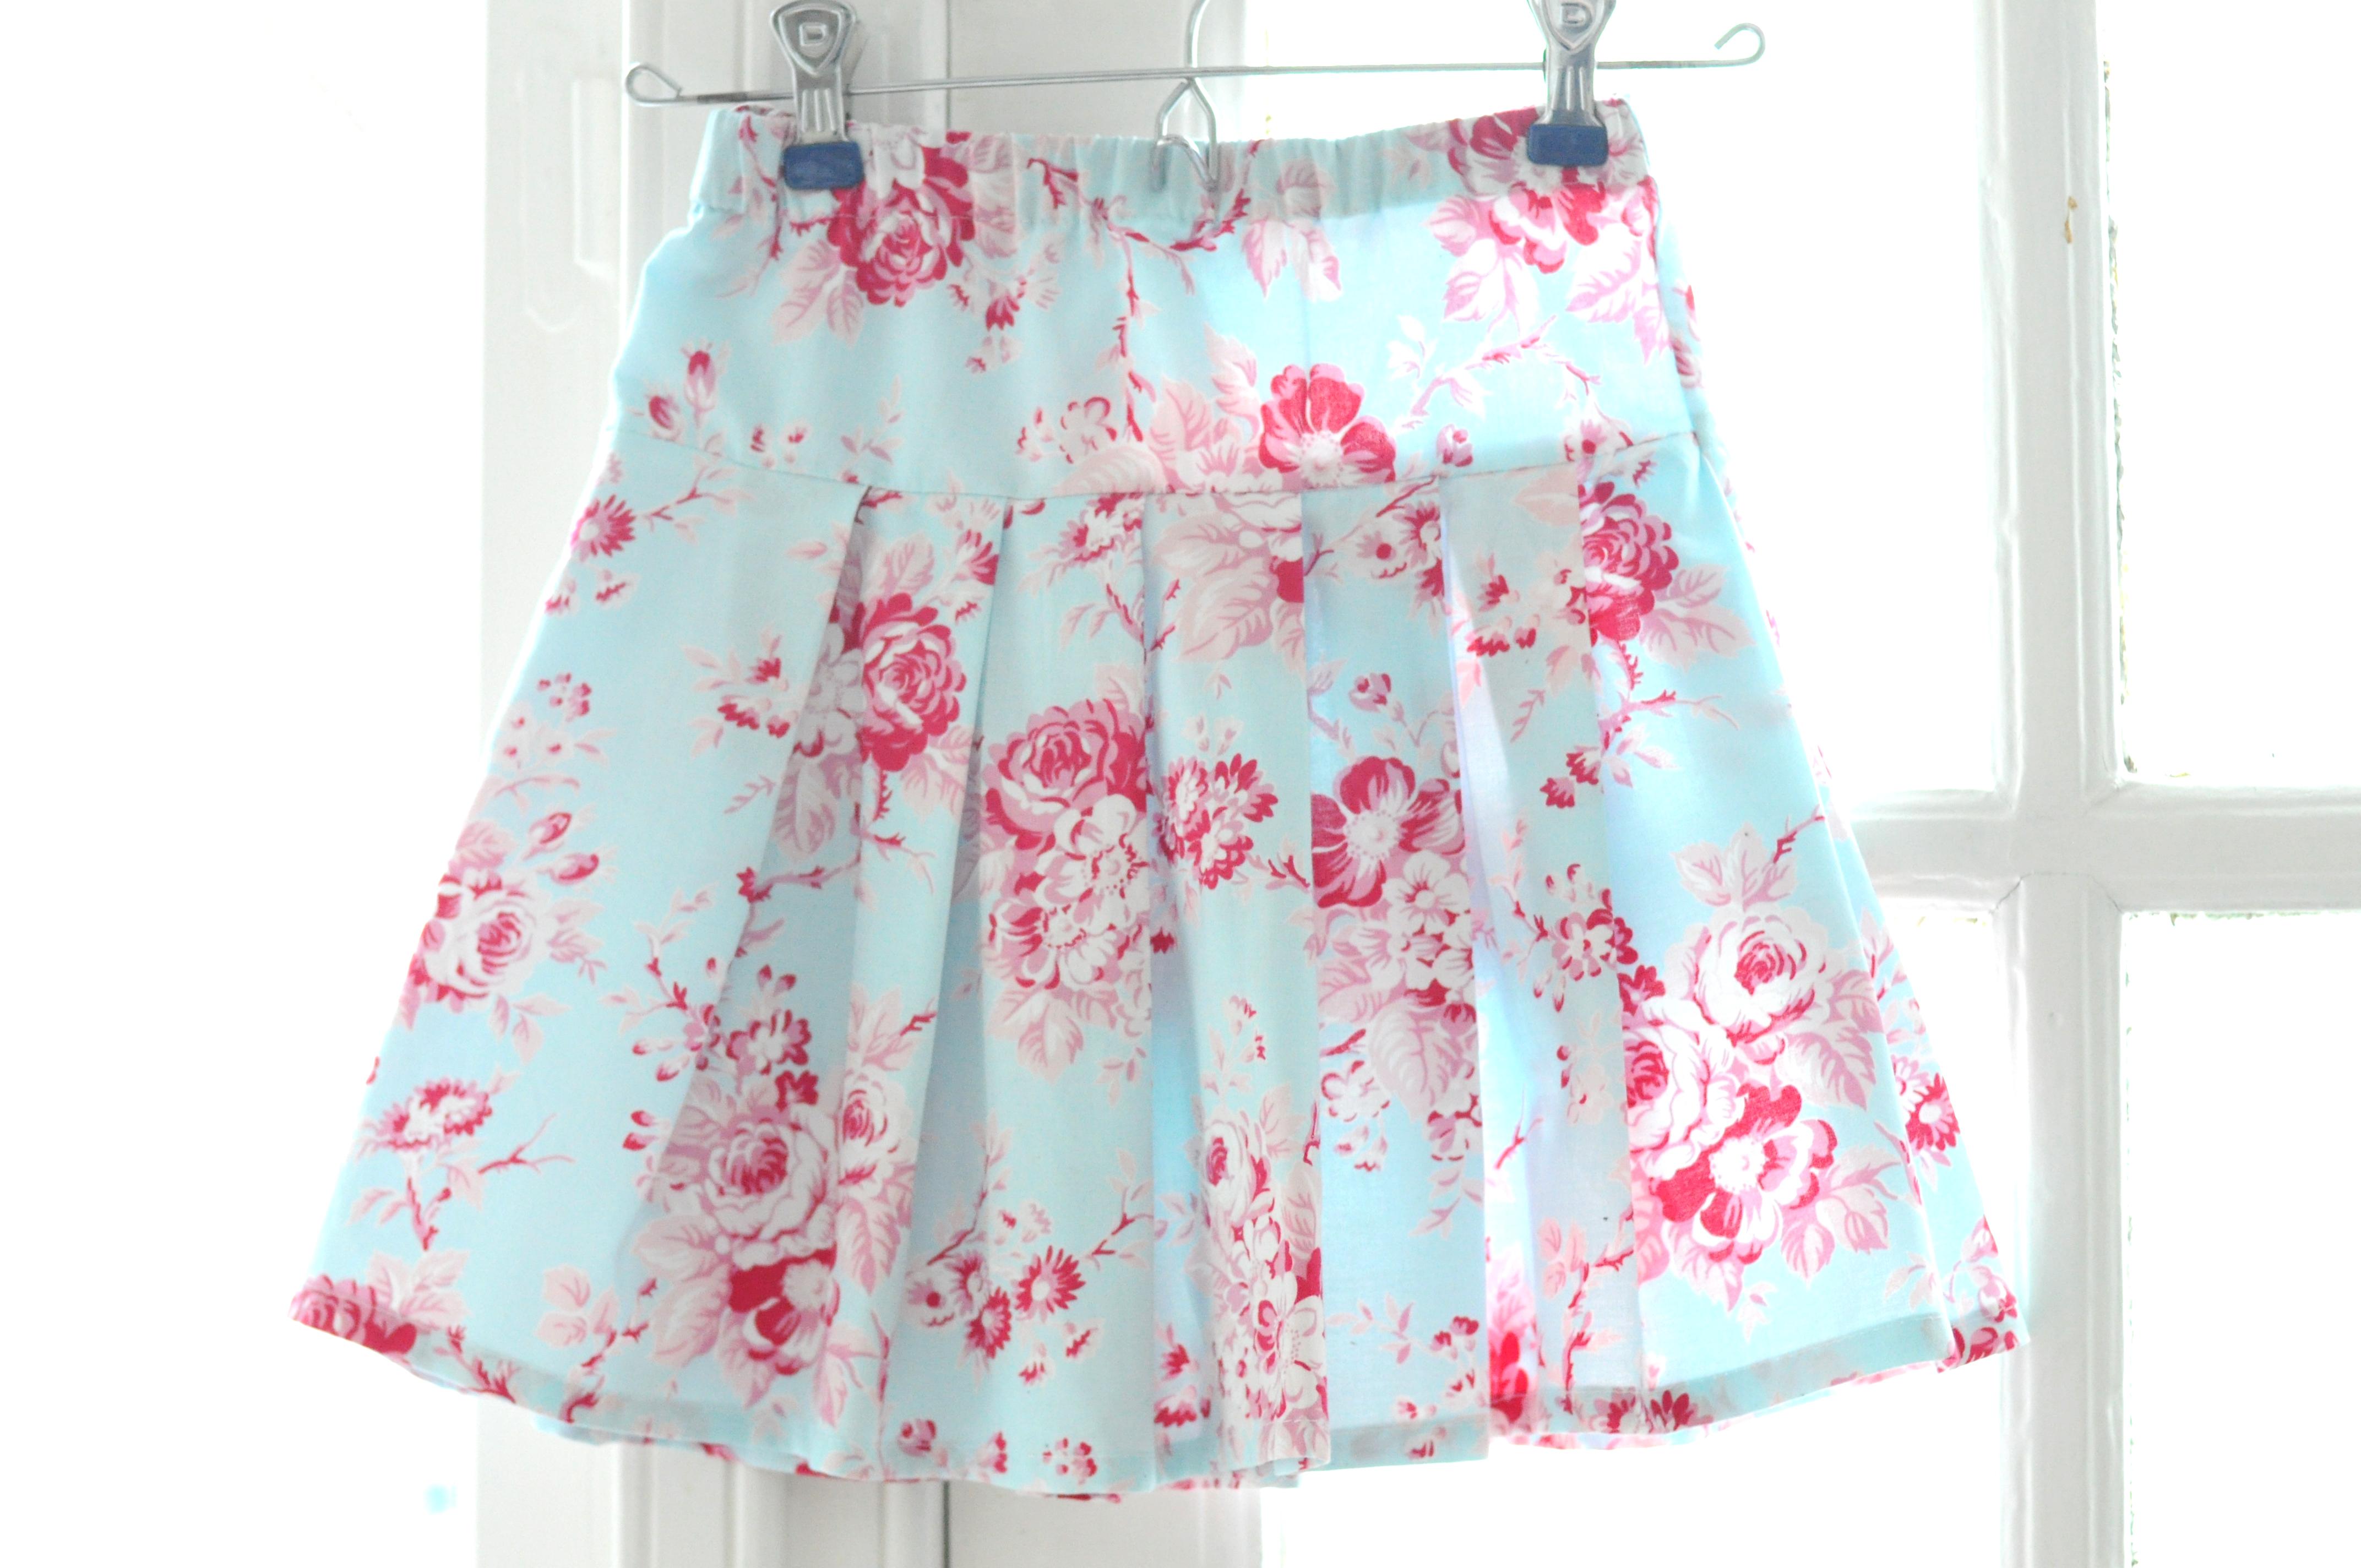 Grand Revival Designs: Easy Peasy Pleated Skirt Tutorial